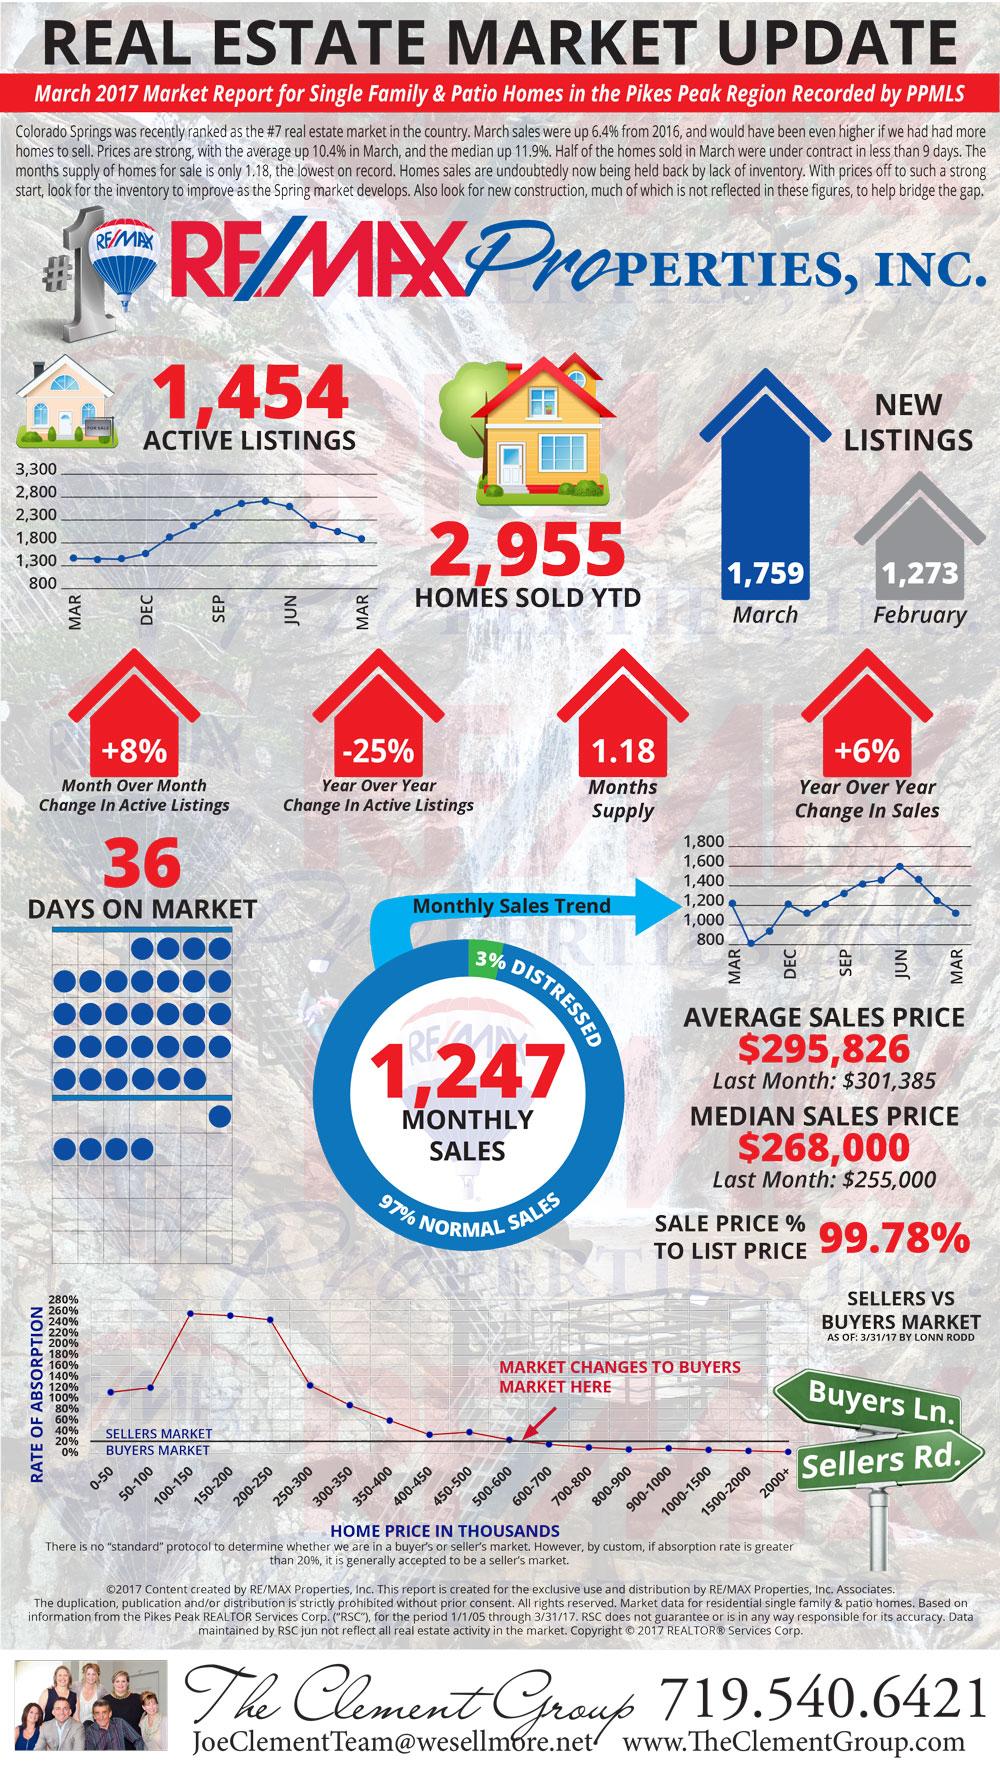 March 2017 Market Update - Colorado Springs Real Estate